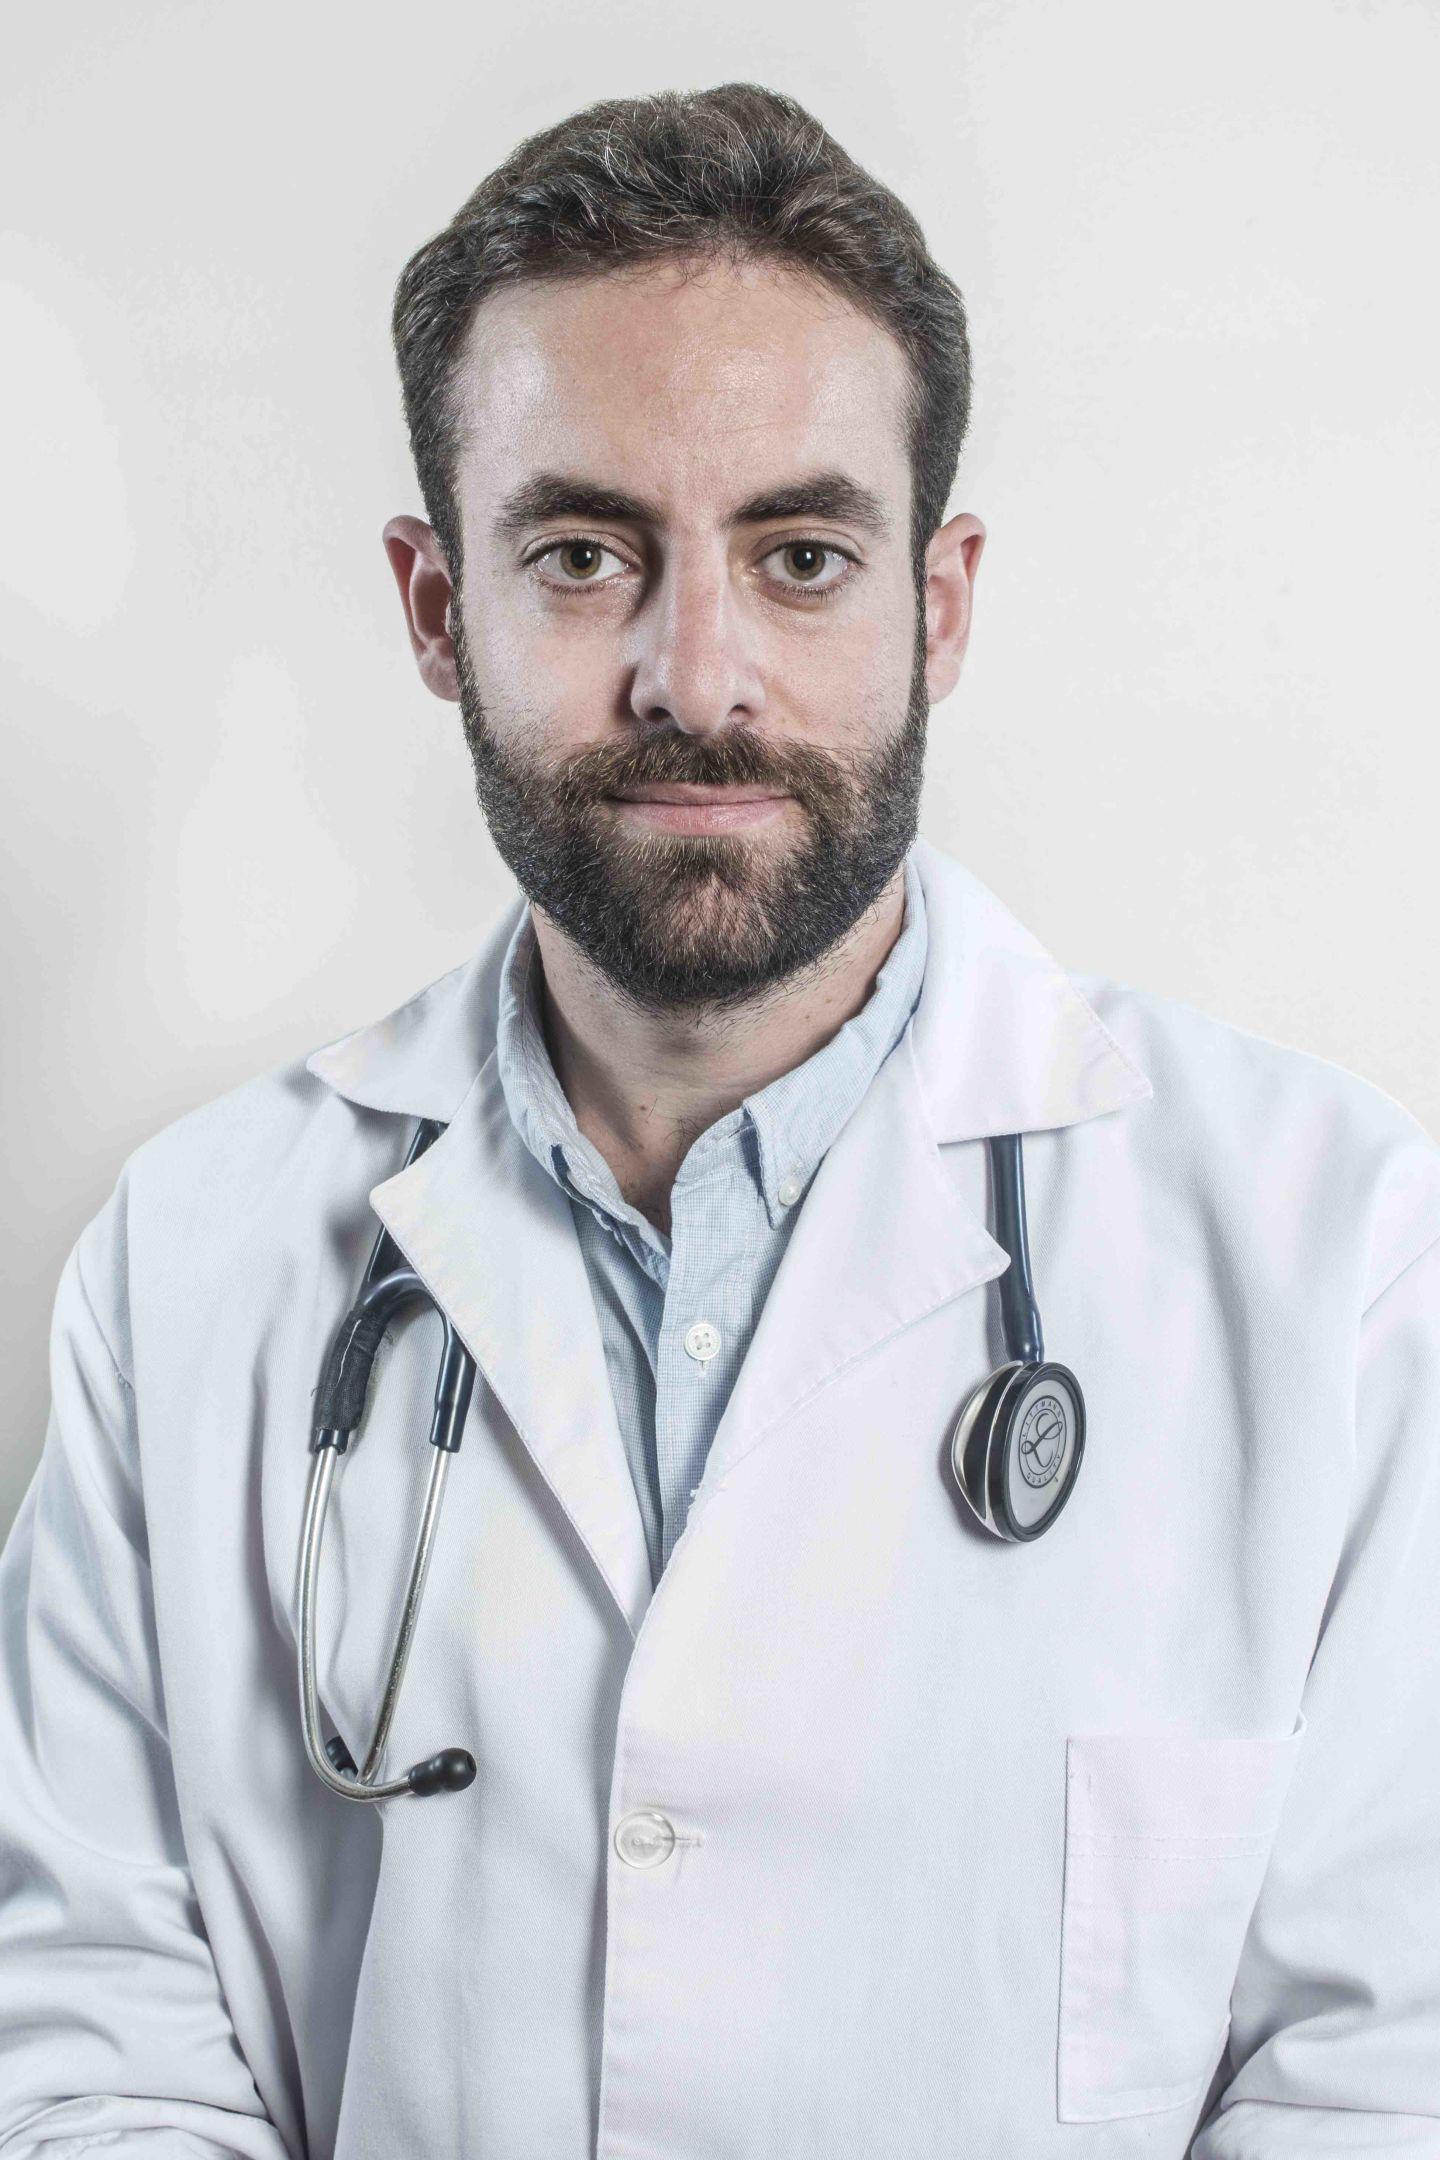 Dr. Pablo Martinotti